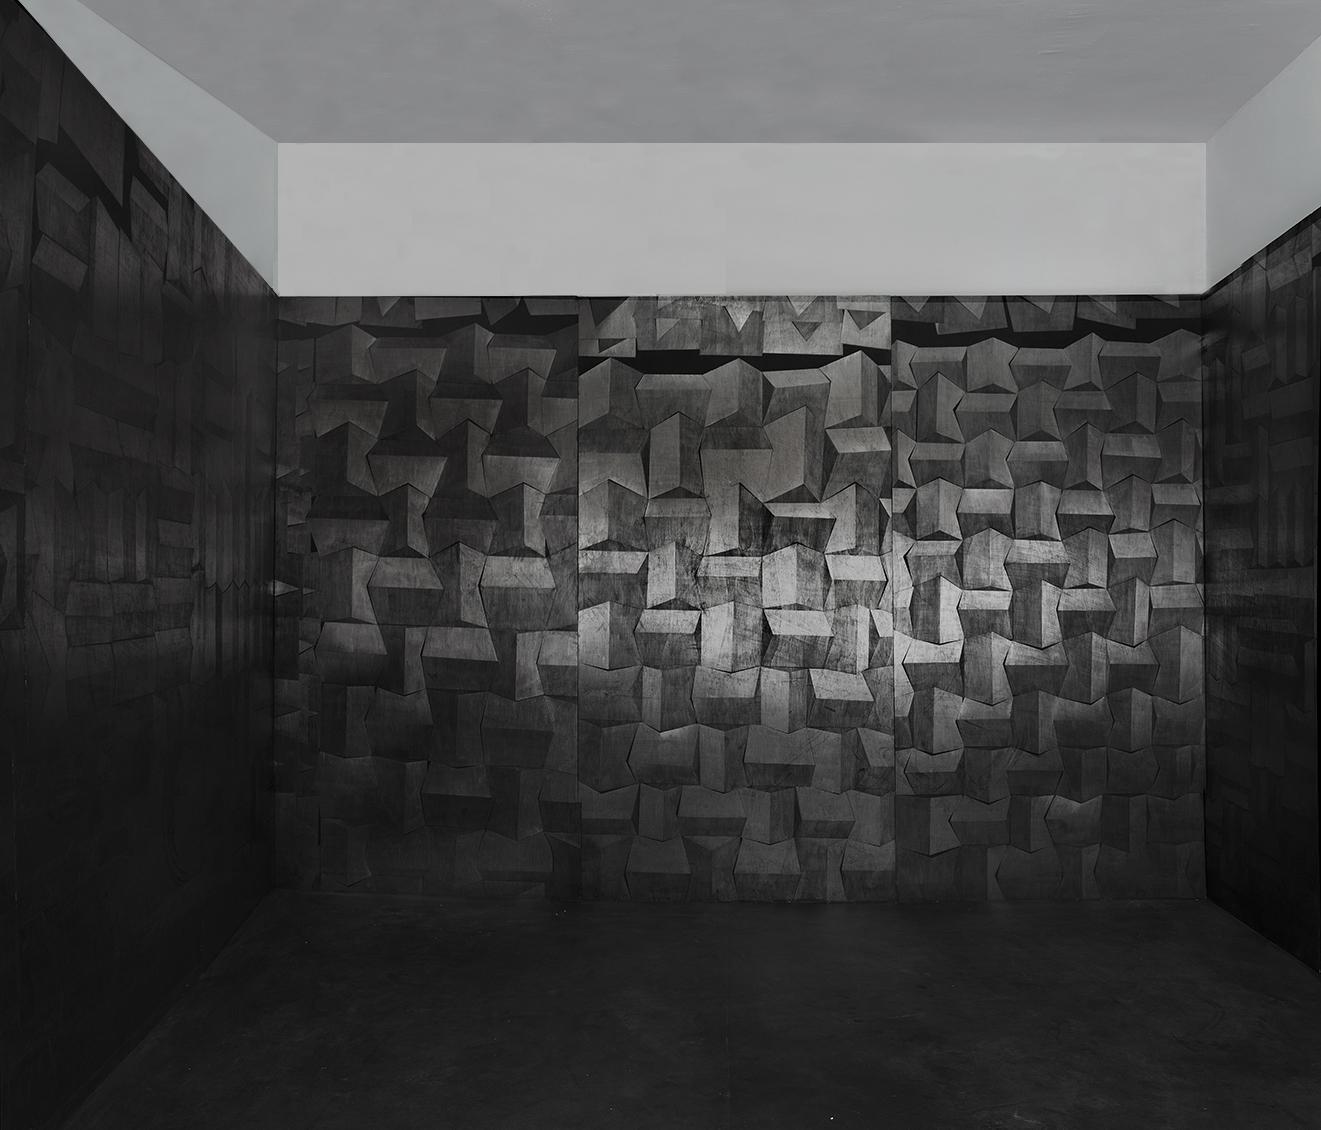 Hado, פחם וגרפיט על עץ,  מיצב, 2014.jpg